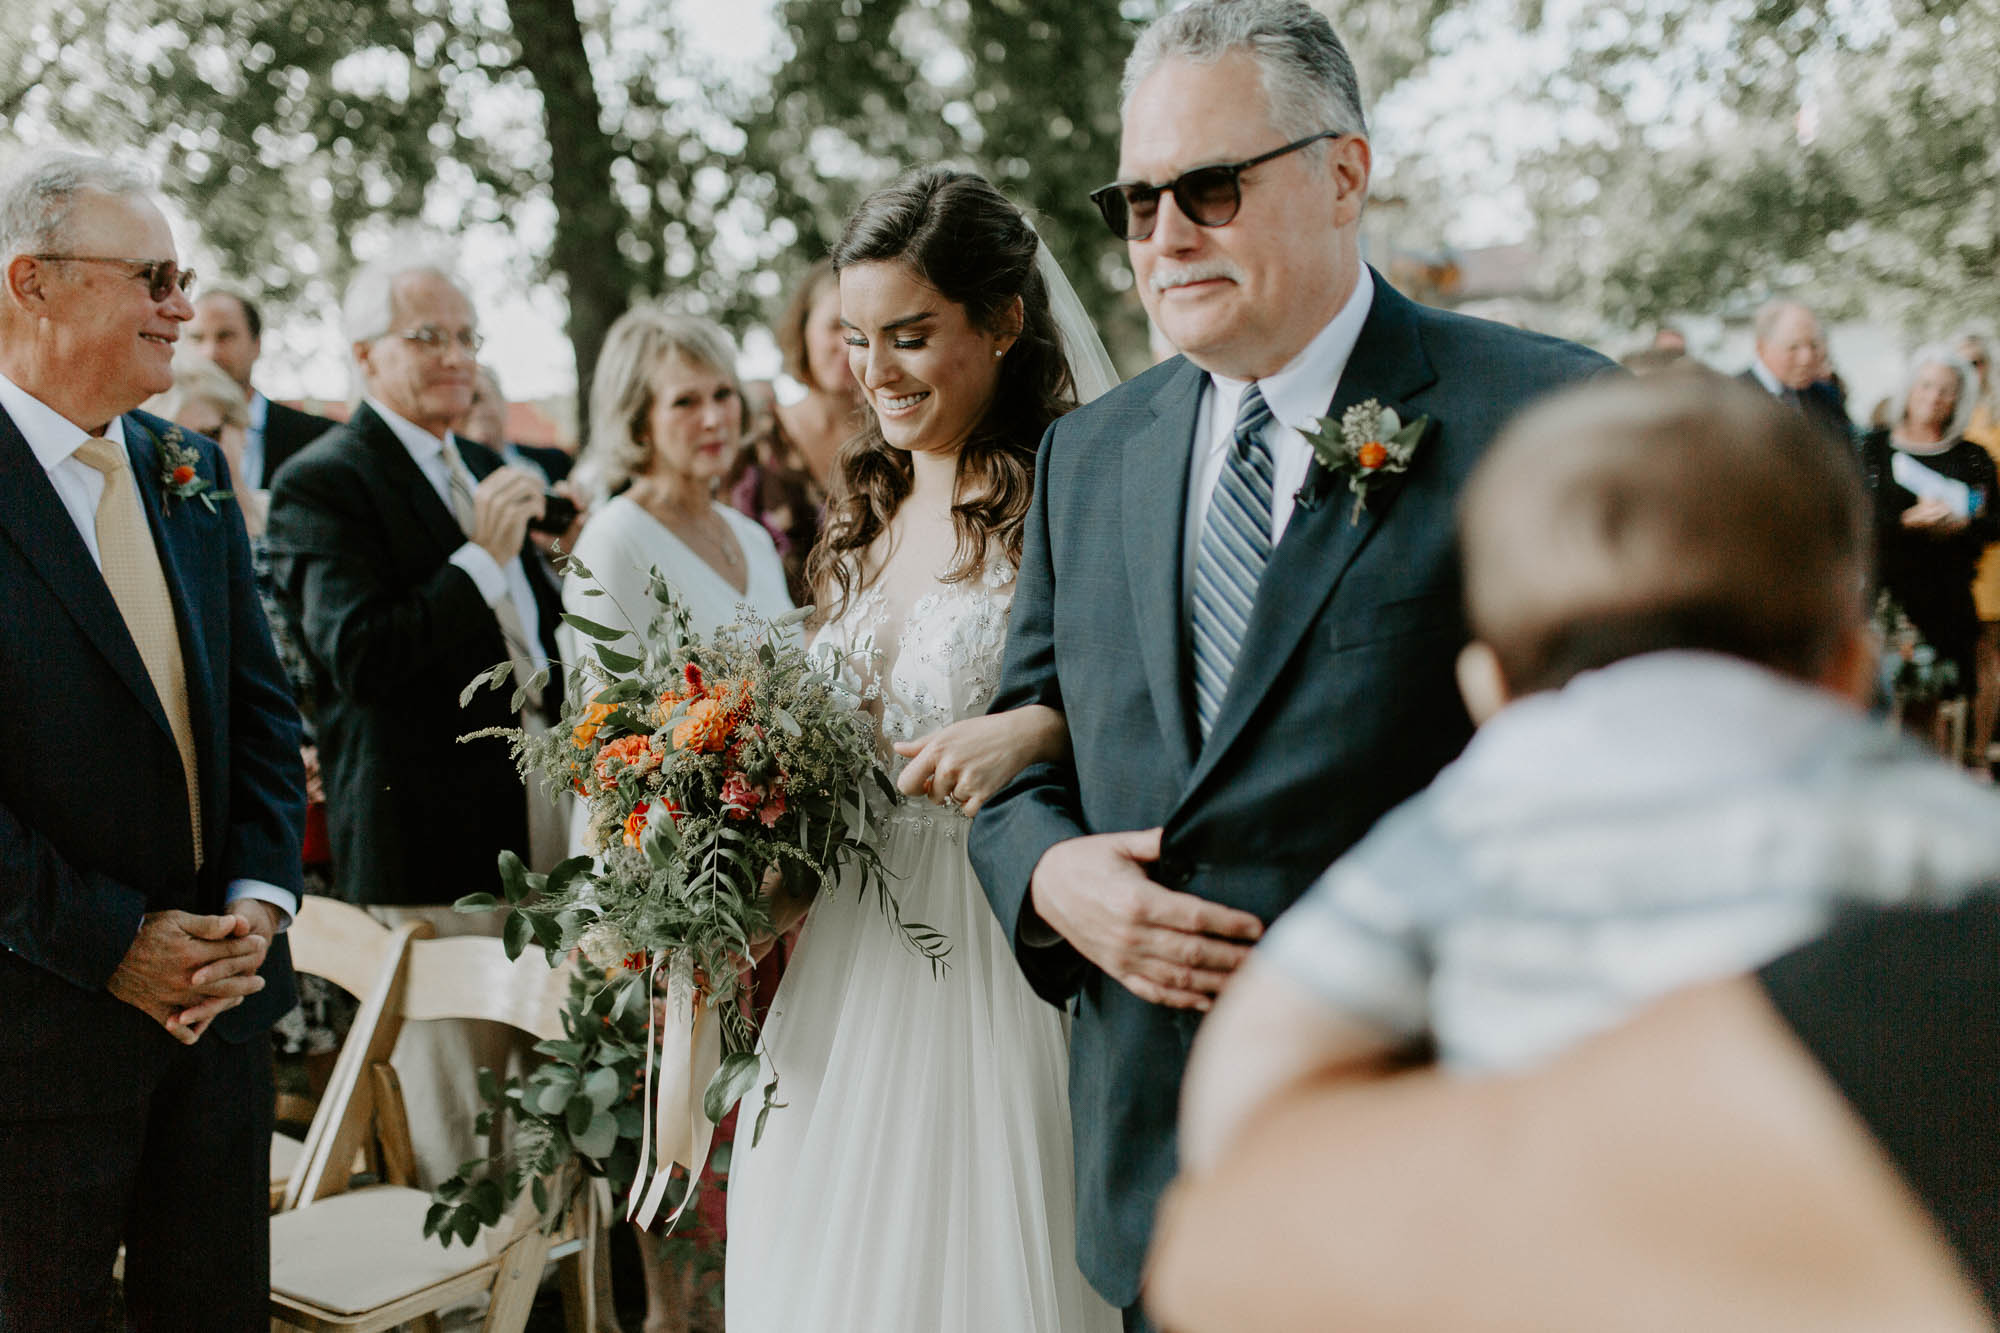 journeyman_distillery_wedding_photographer_chicago_il_wright_photographs-3756.jpg